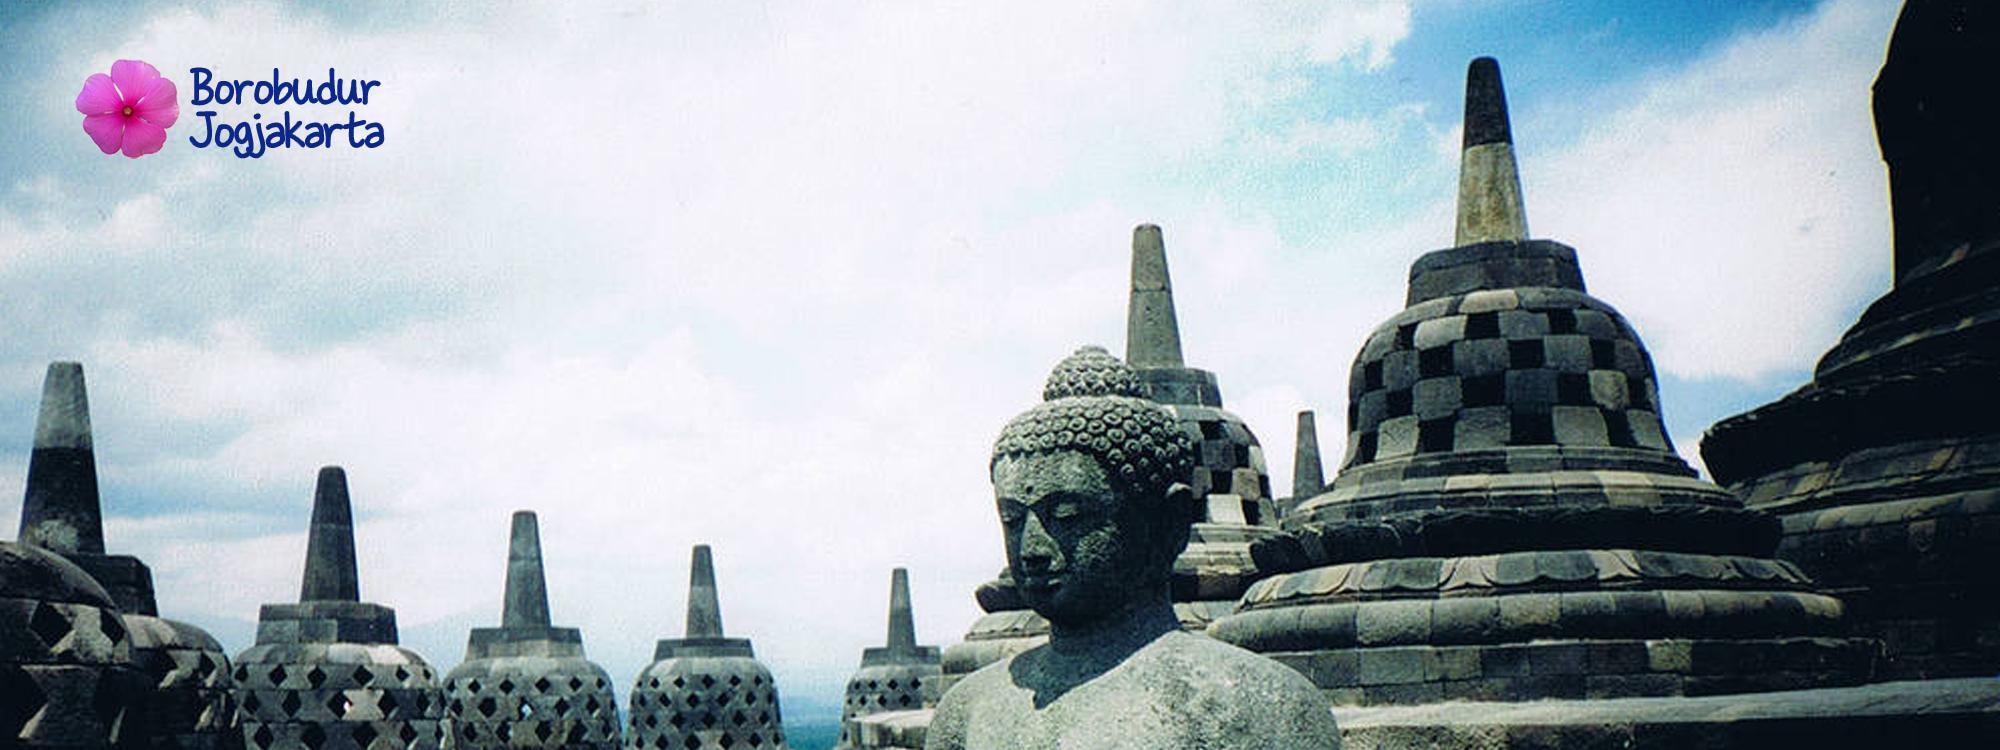 10992758844 cdf38999eb o Candi Borobudur   Jogjakarta